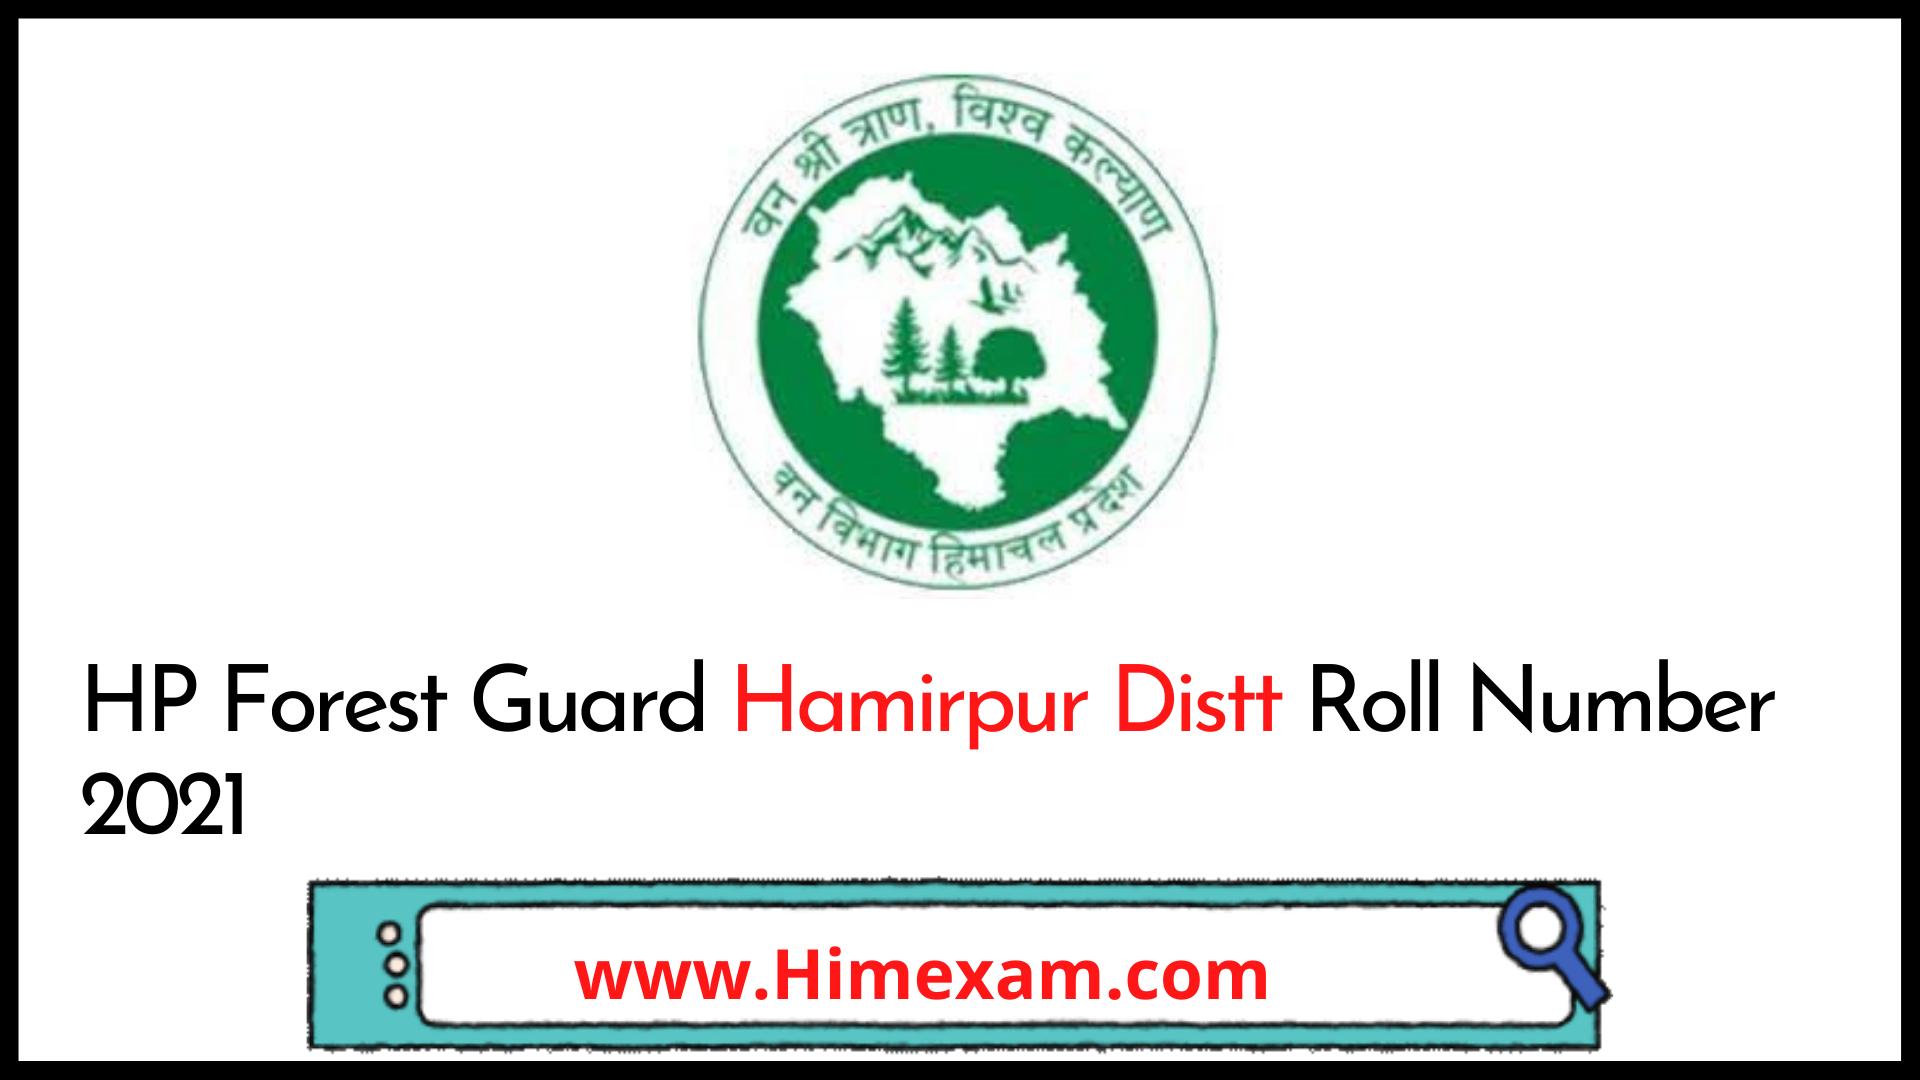 HP Forest Guard Hamirpur Distt Roll Number 2021